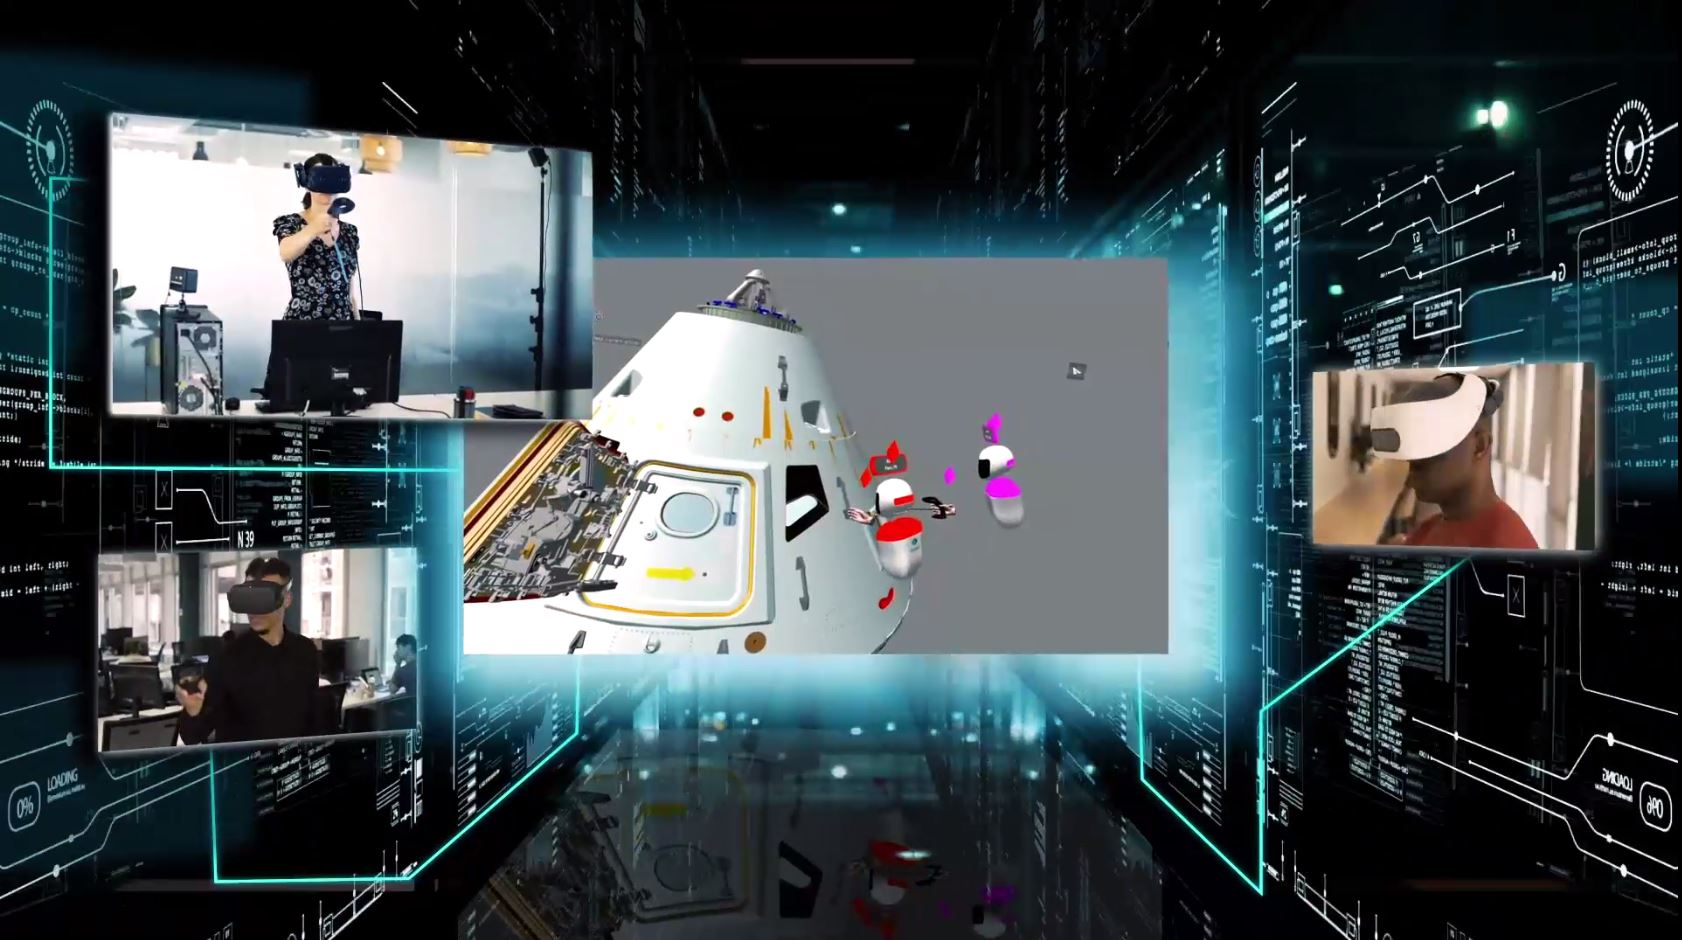 TechViz is exhibiting at VRDays 2020